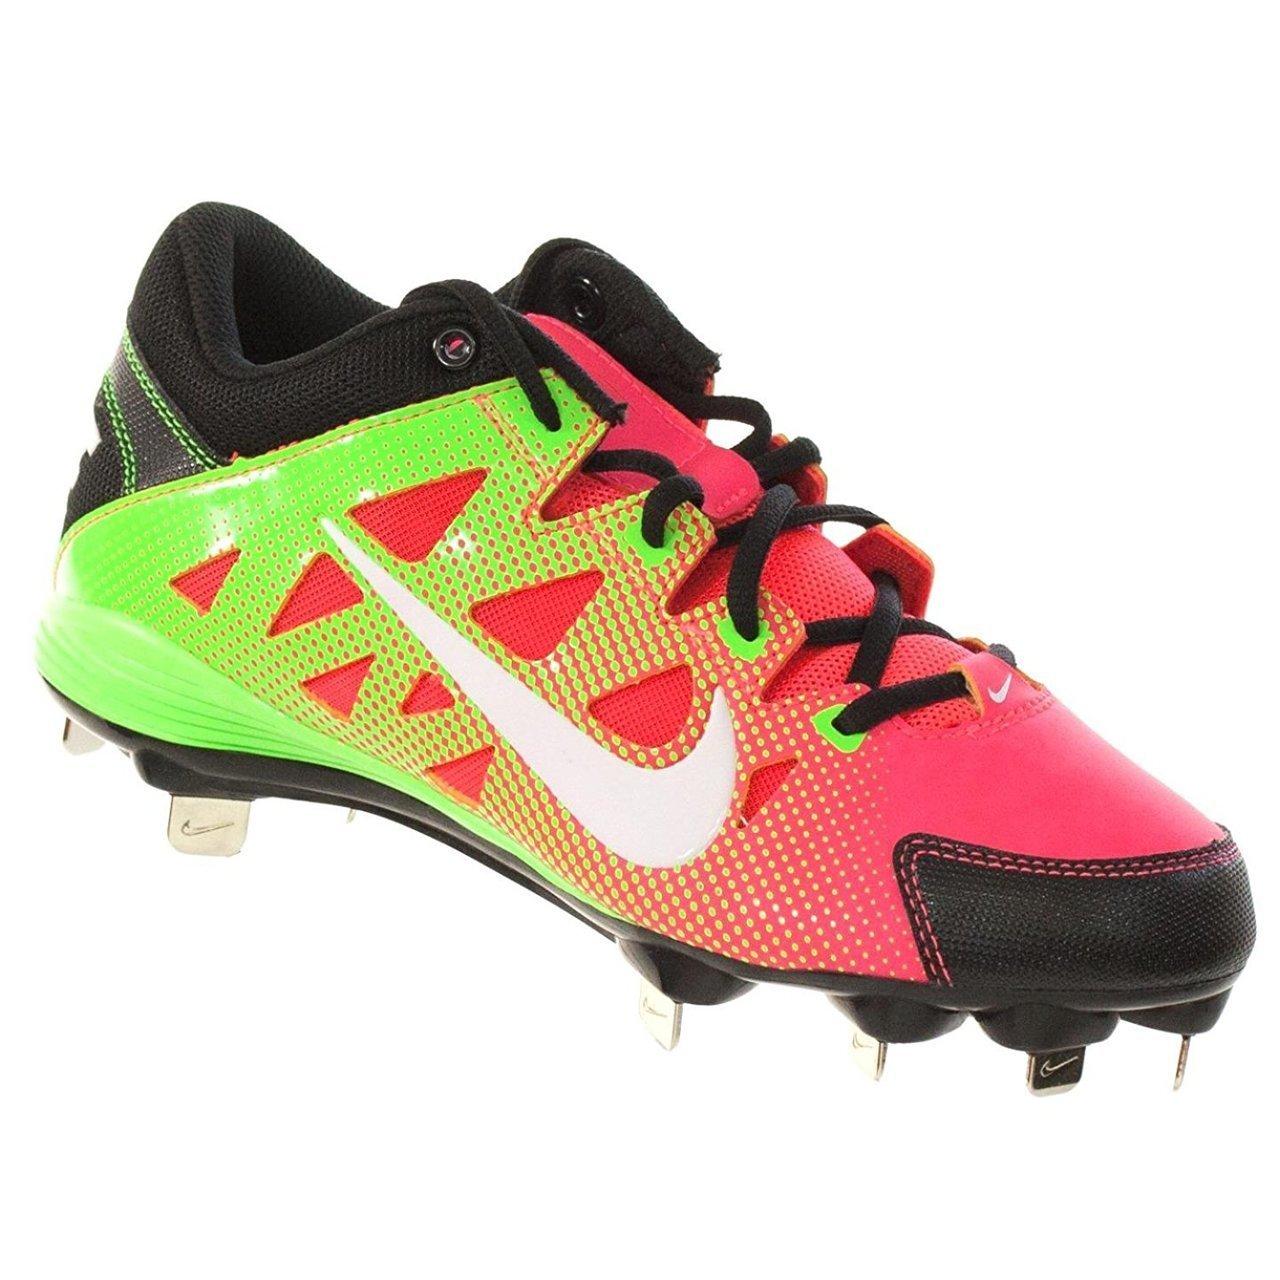 Nike Hyperdiamond Strike MTL Softball Cleats (8.5)